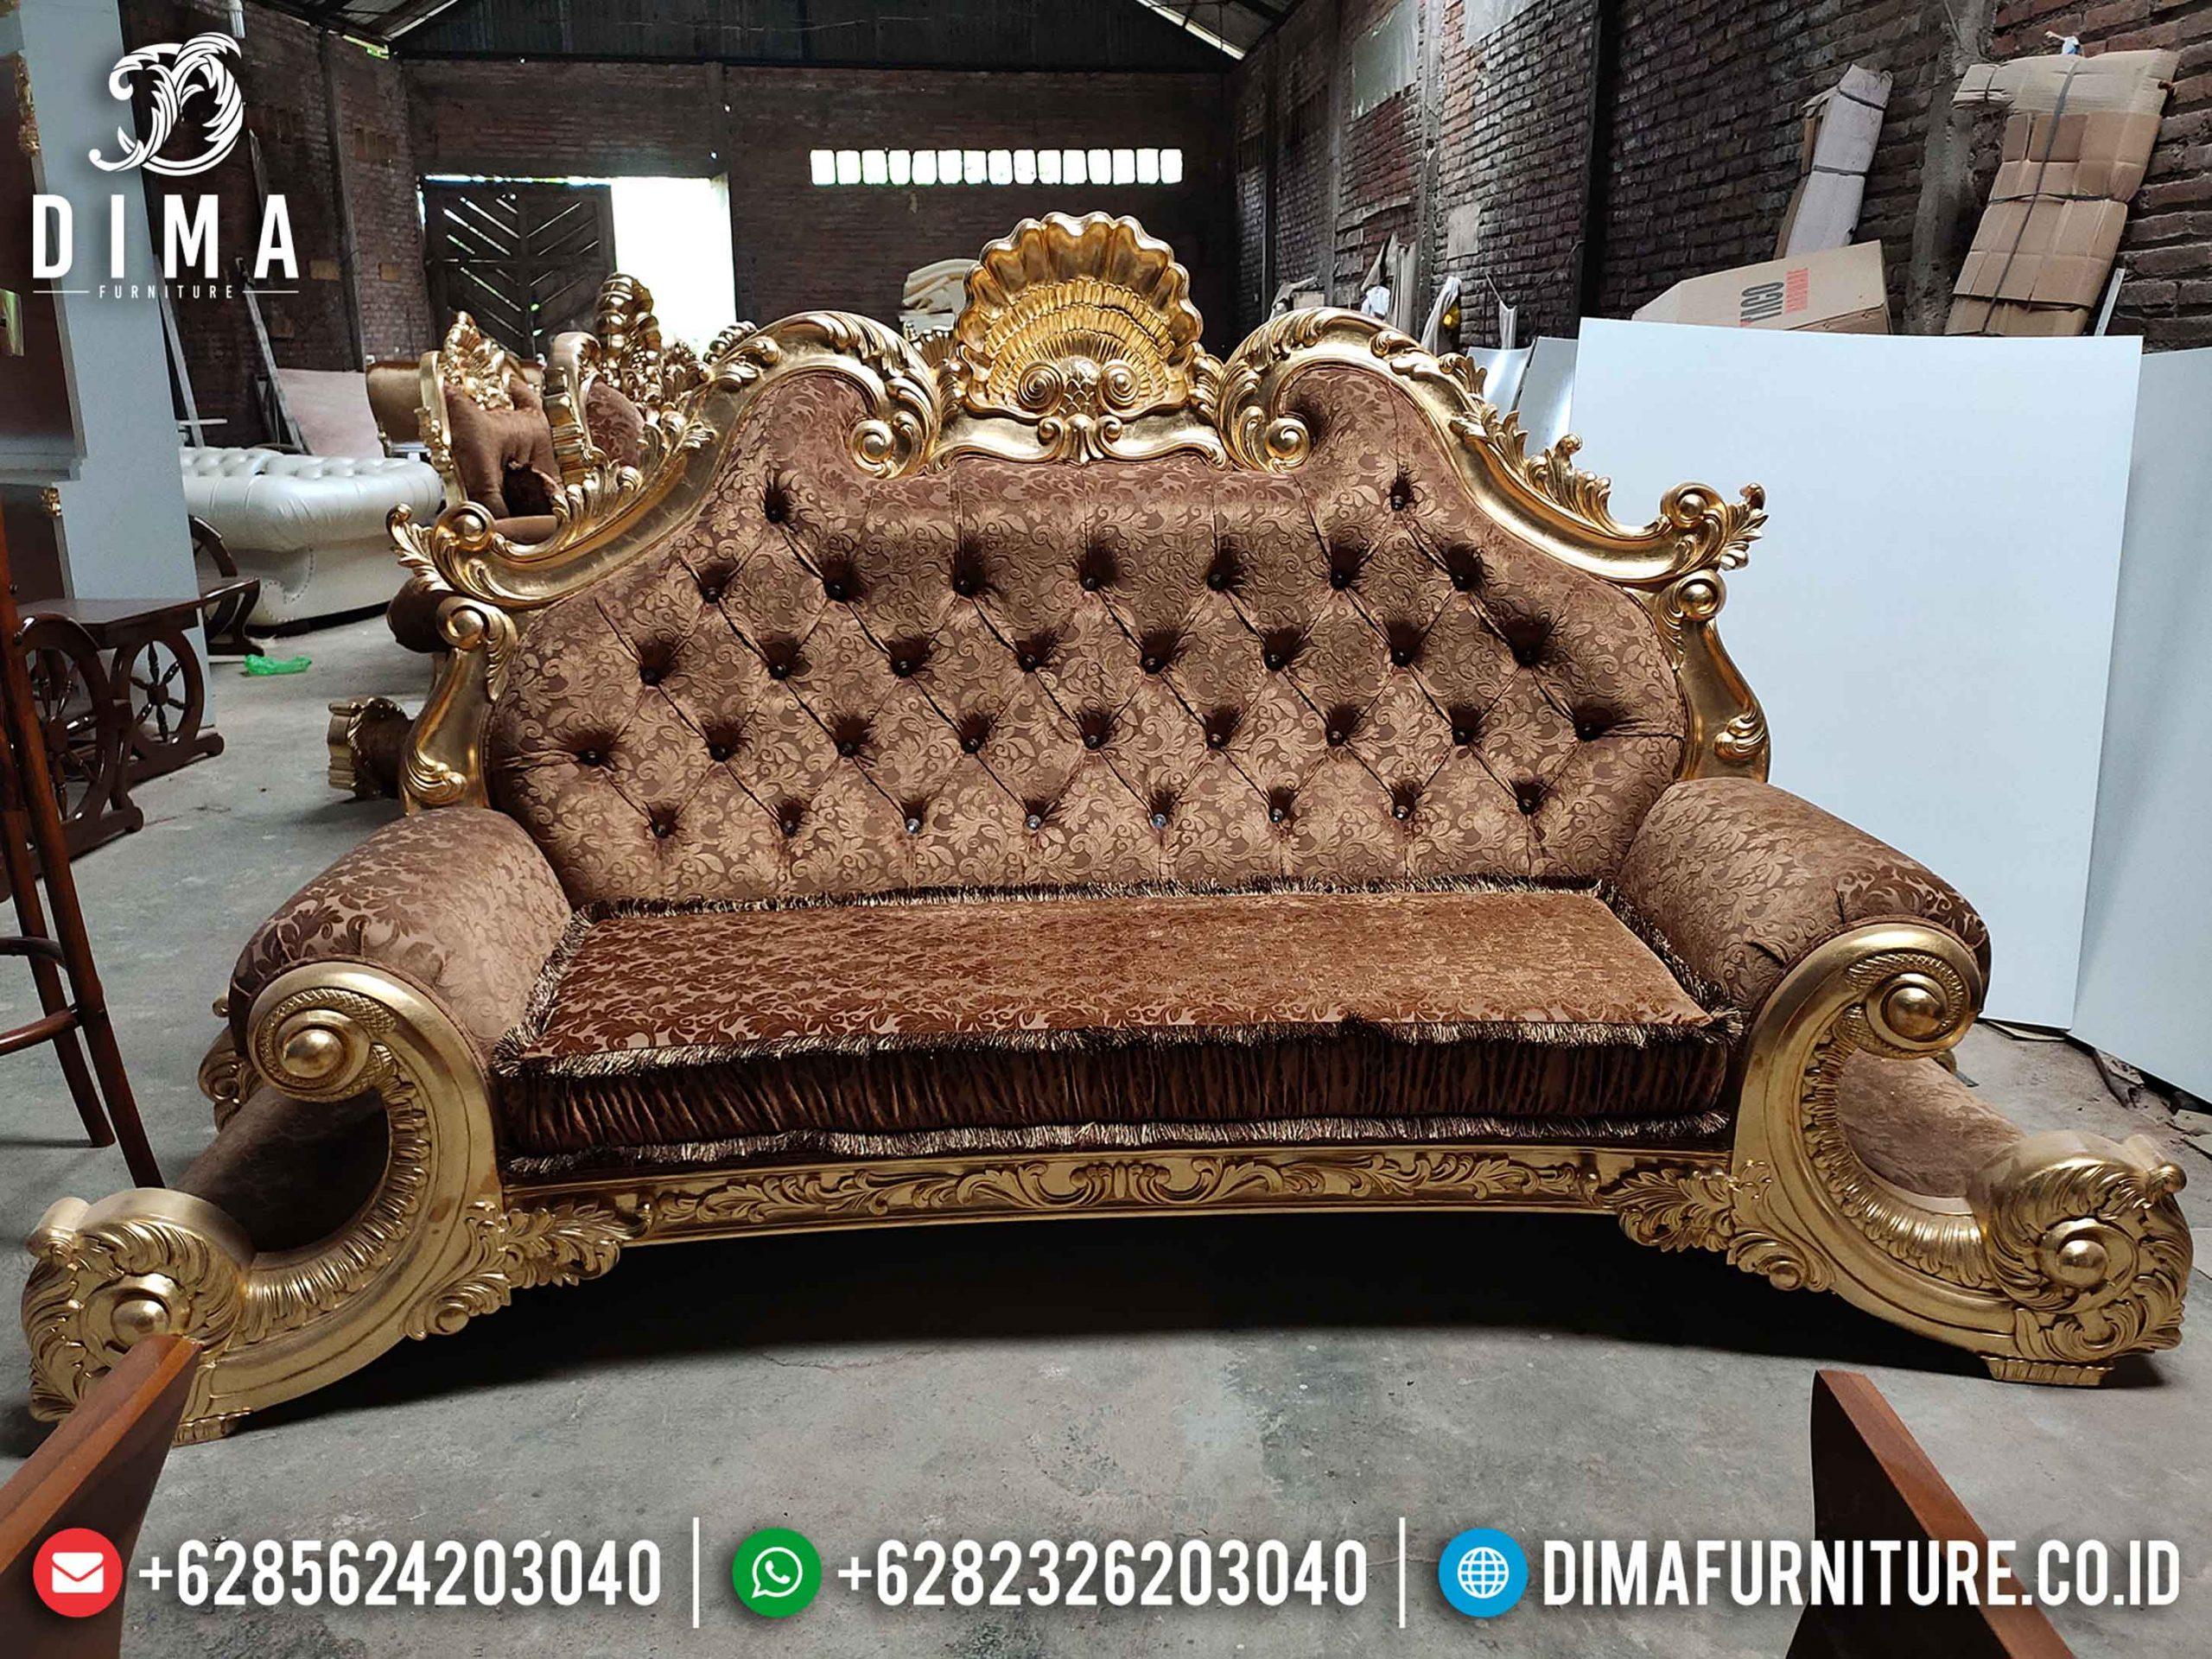 Jackson Style Sofa Tamu Mewah 3 Dudukan High Quality Luxury Design Terbaru TTJ-1280